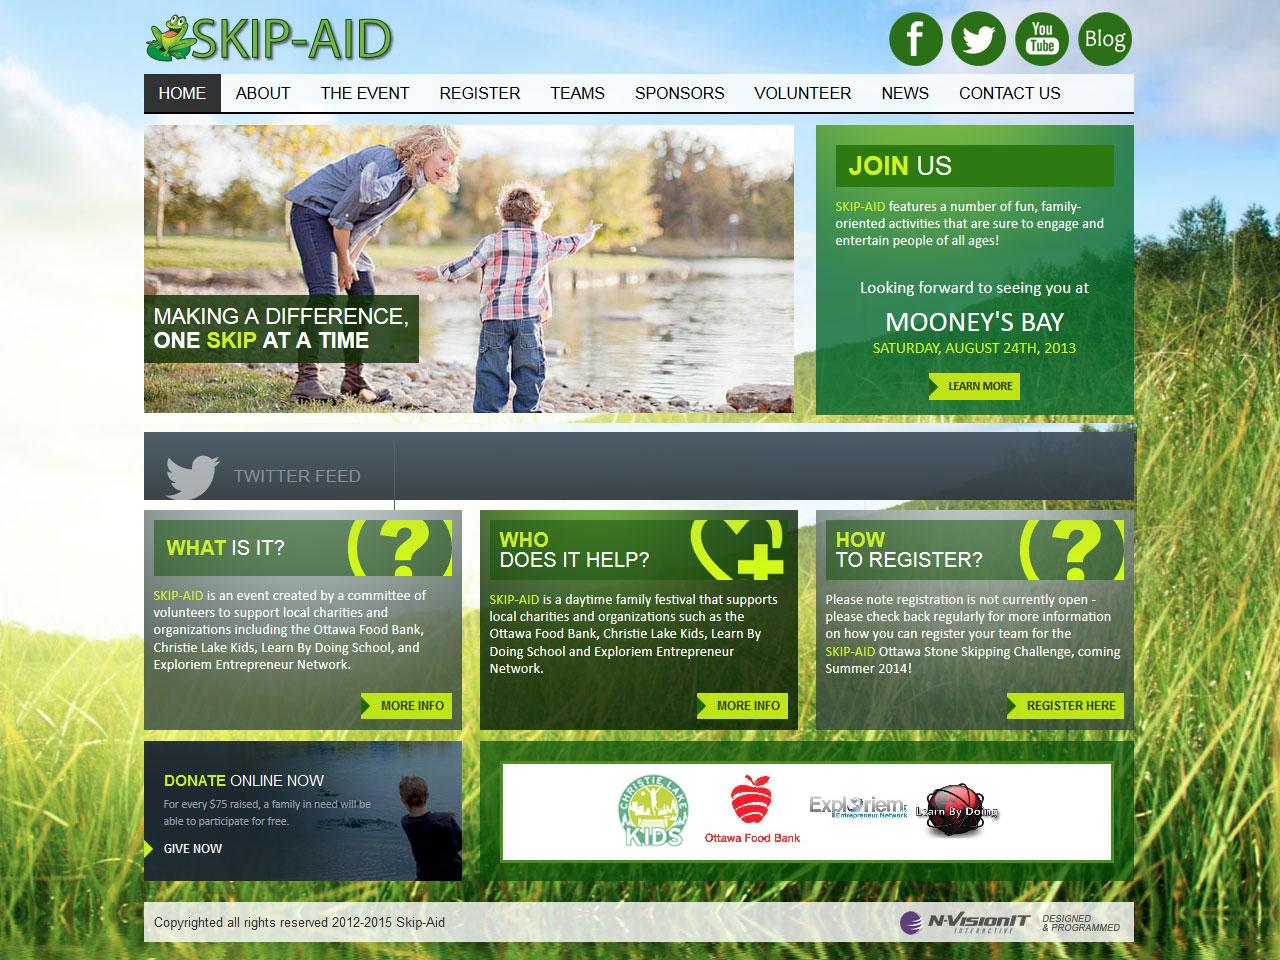 skip-aid